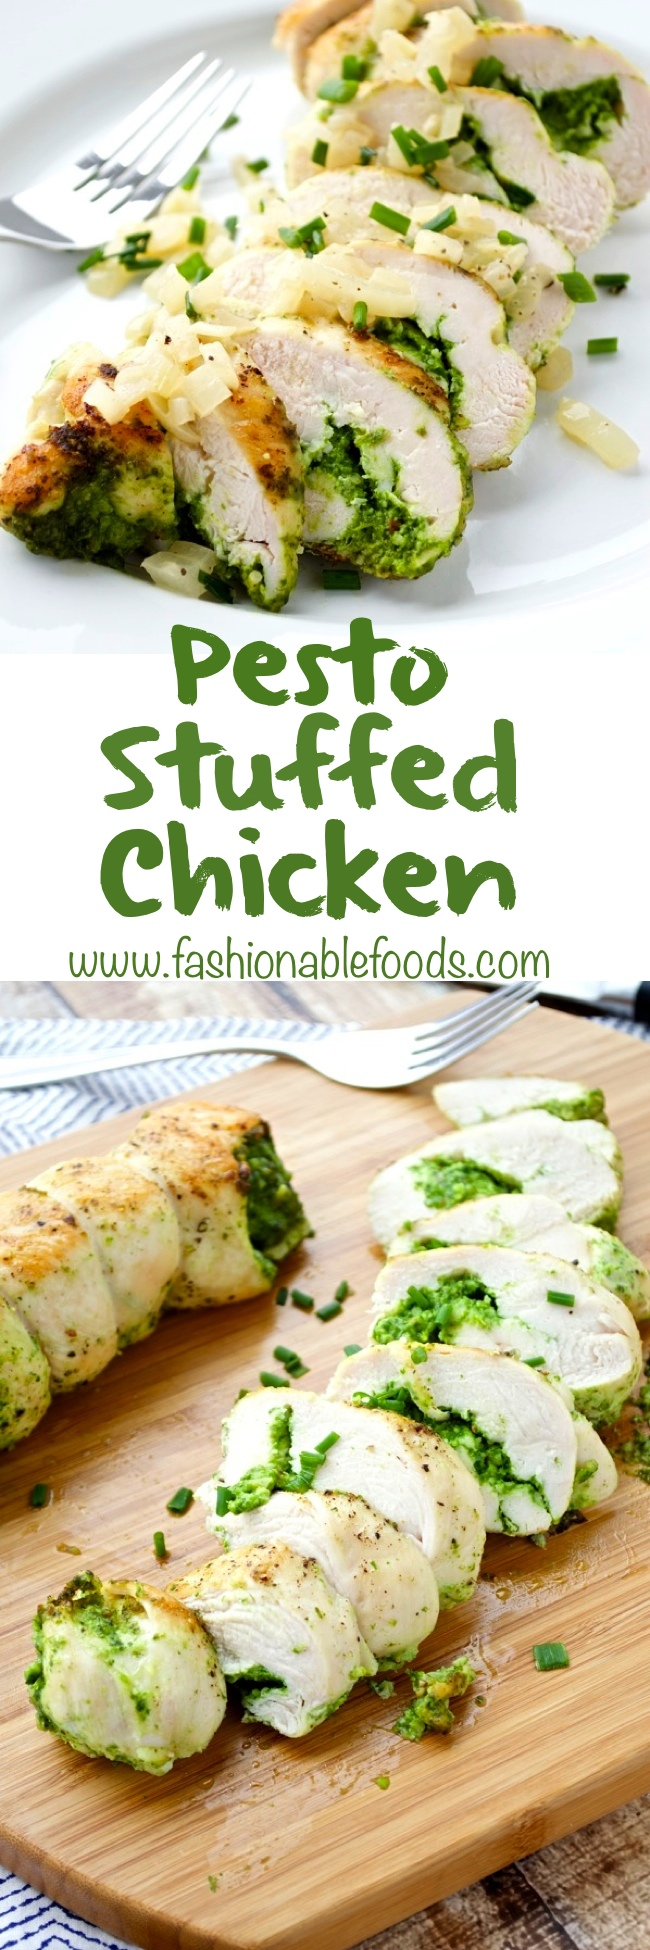 Pesto Stuffed Chicken Pin